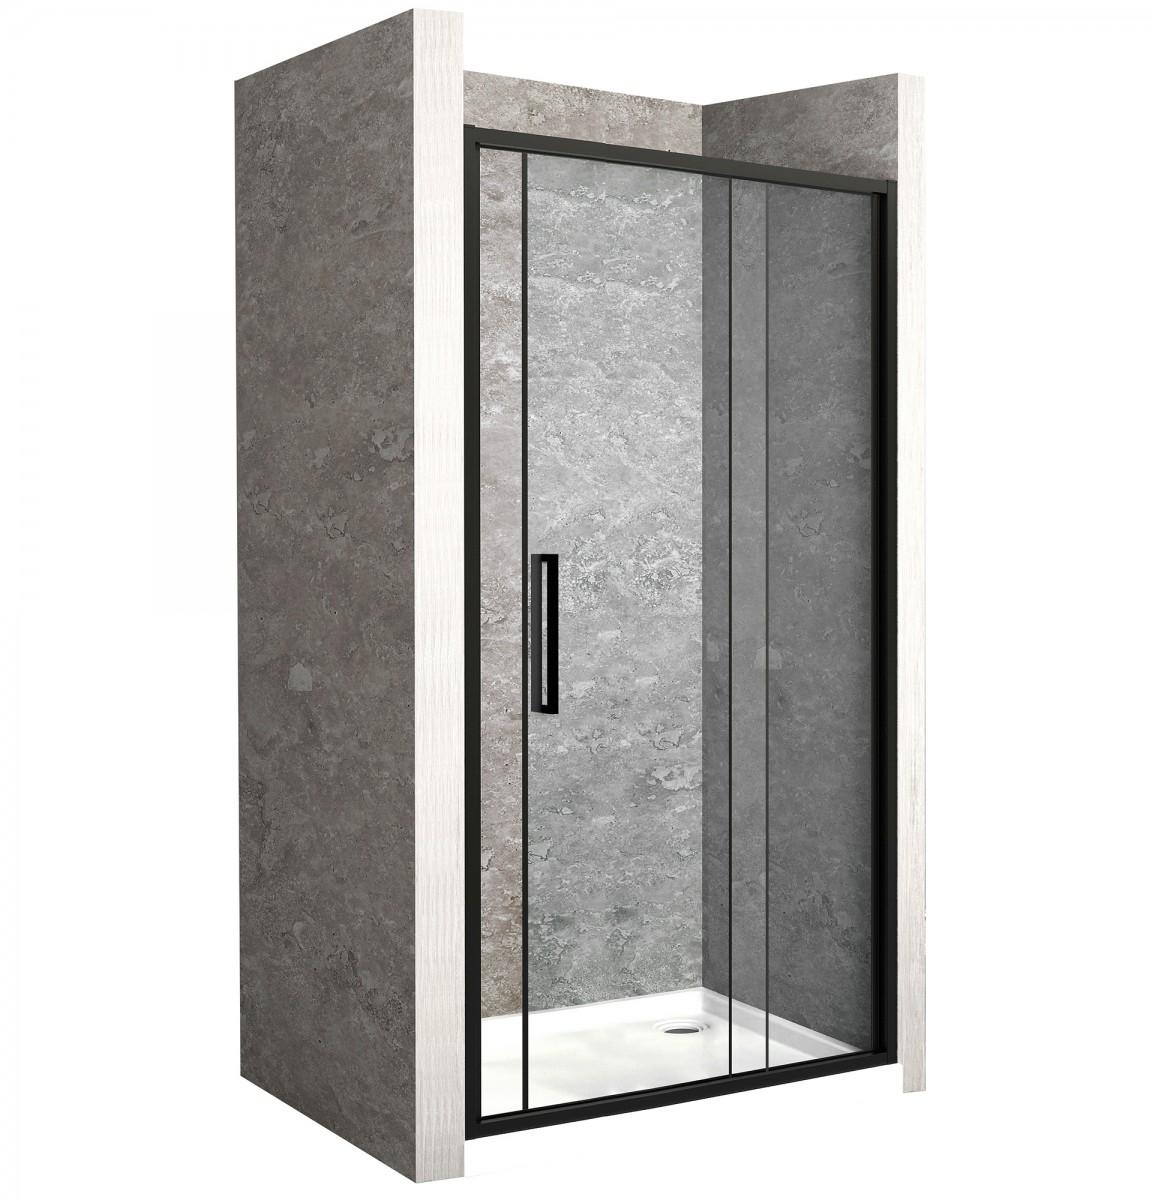 Sprchové dveře Rapid Slide 110 cm